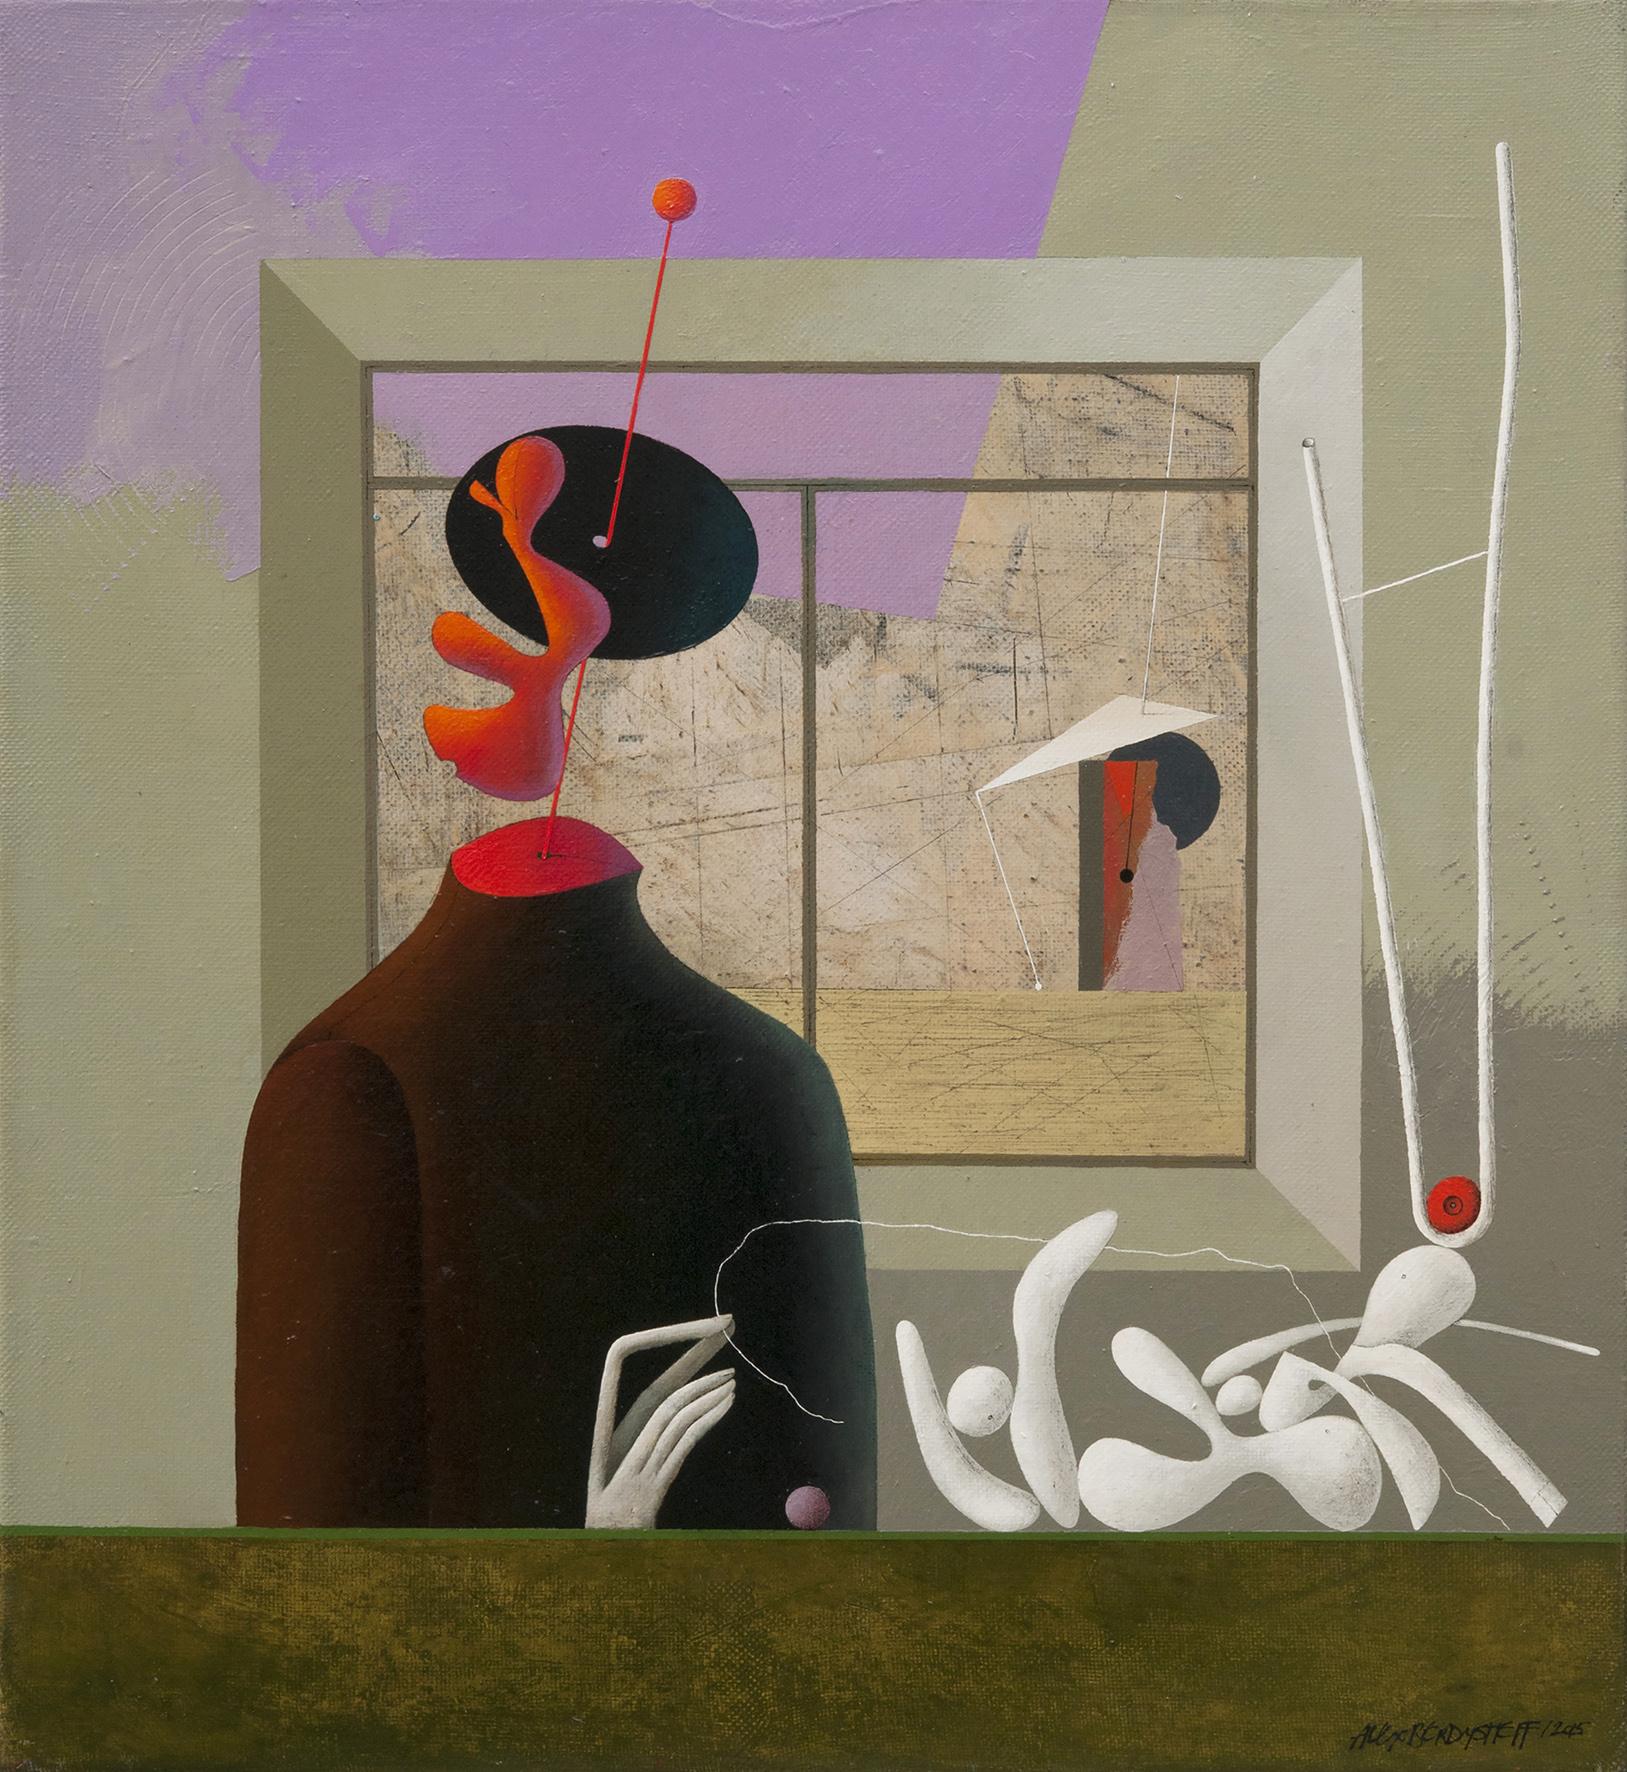 Solitude, oil on canvas, 60x55 cm, 2015